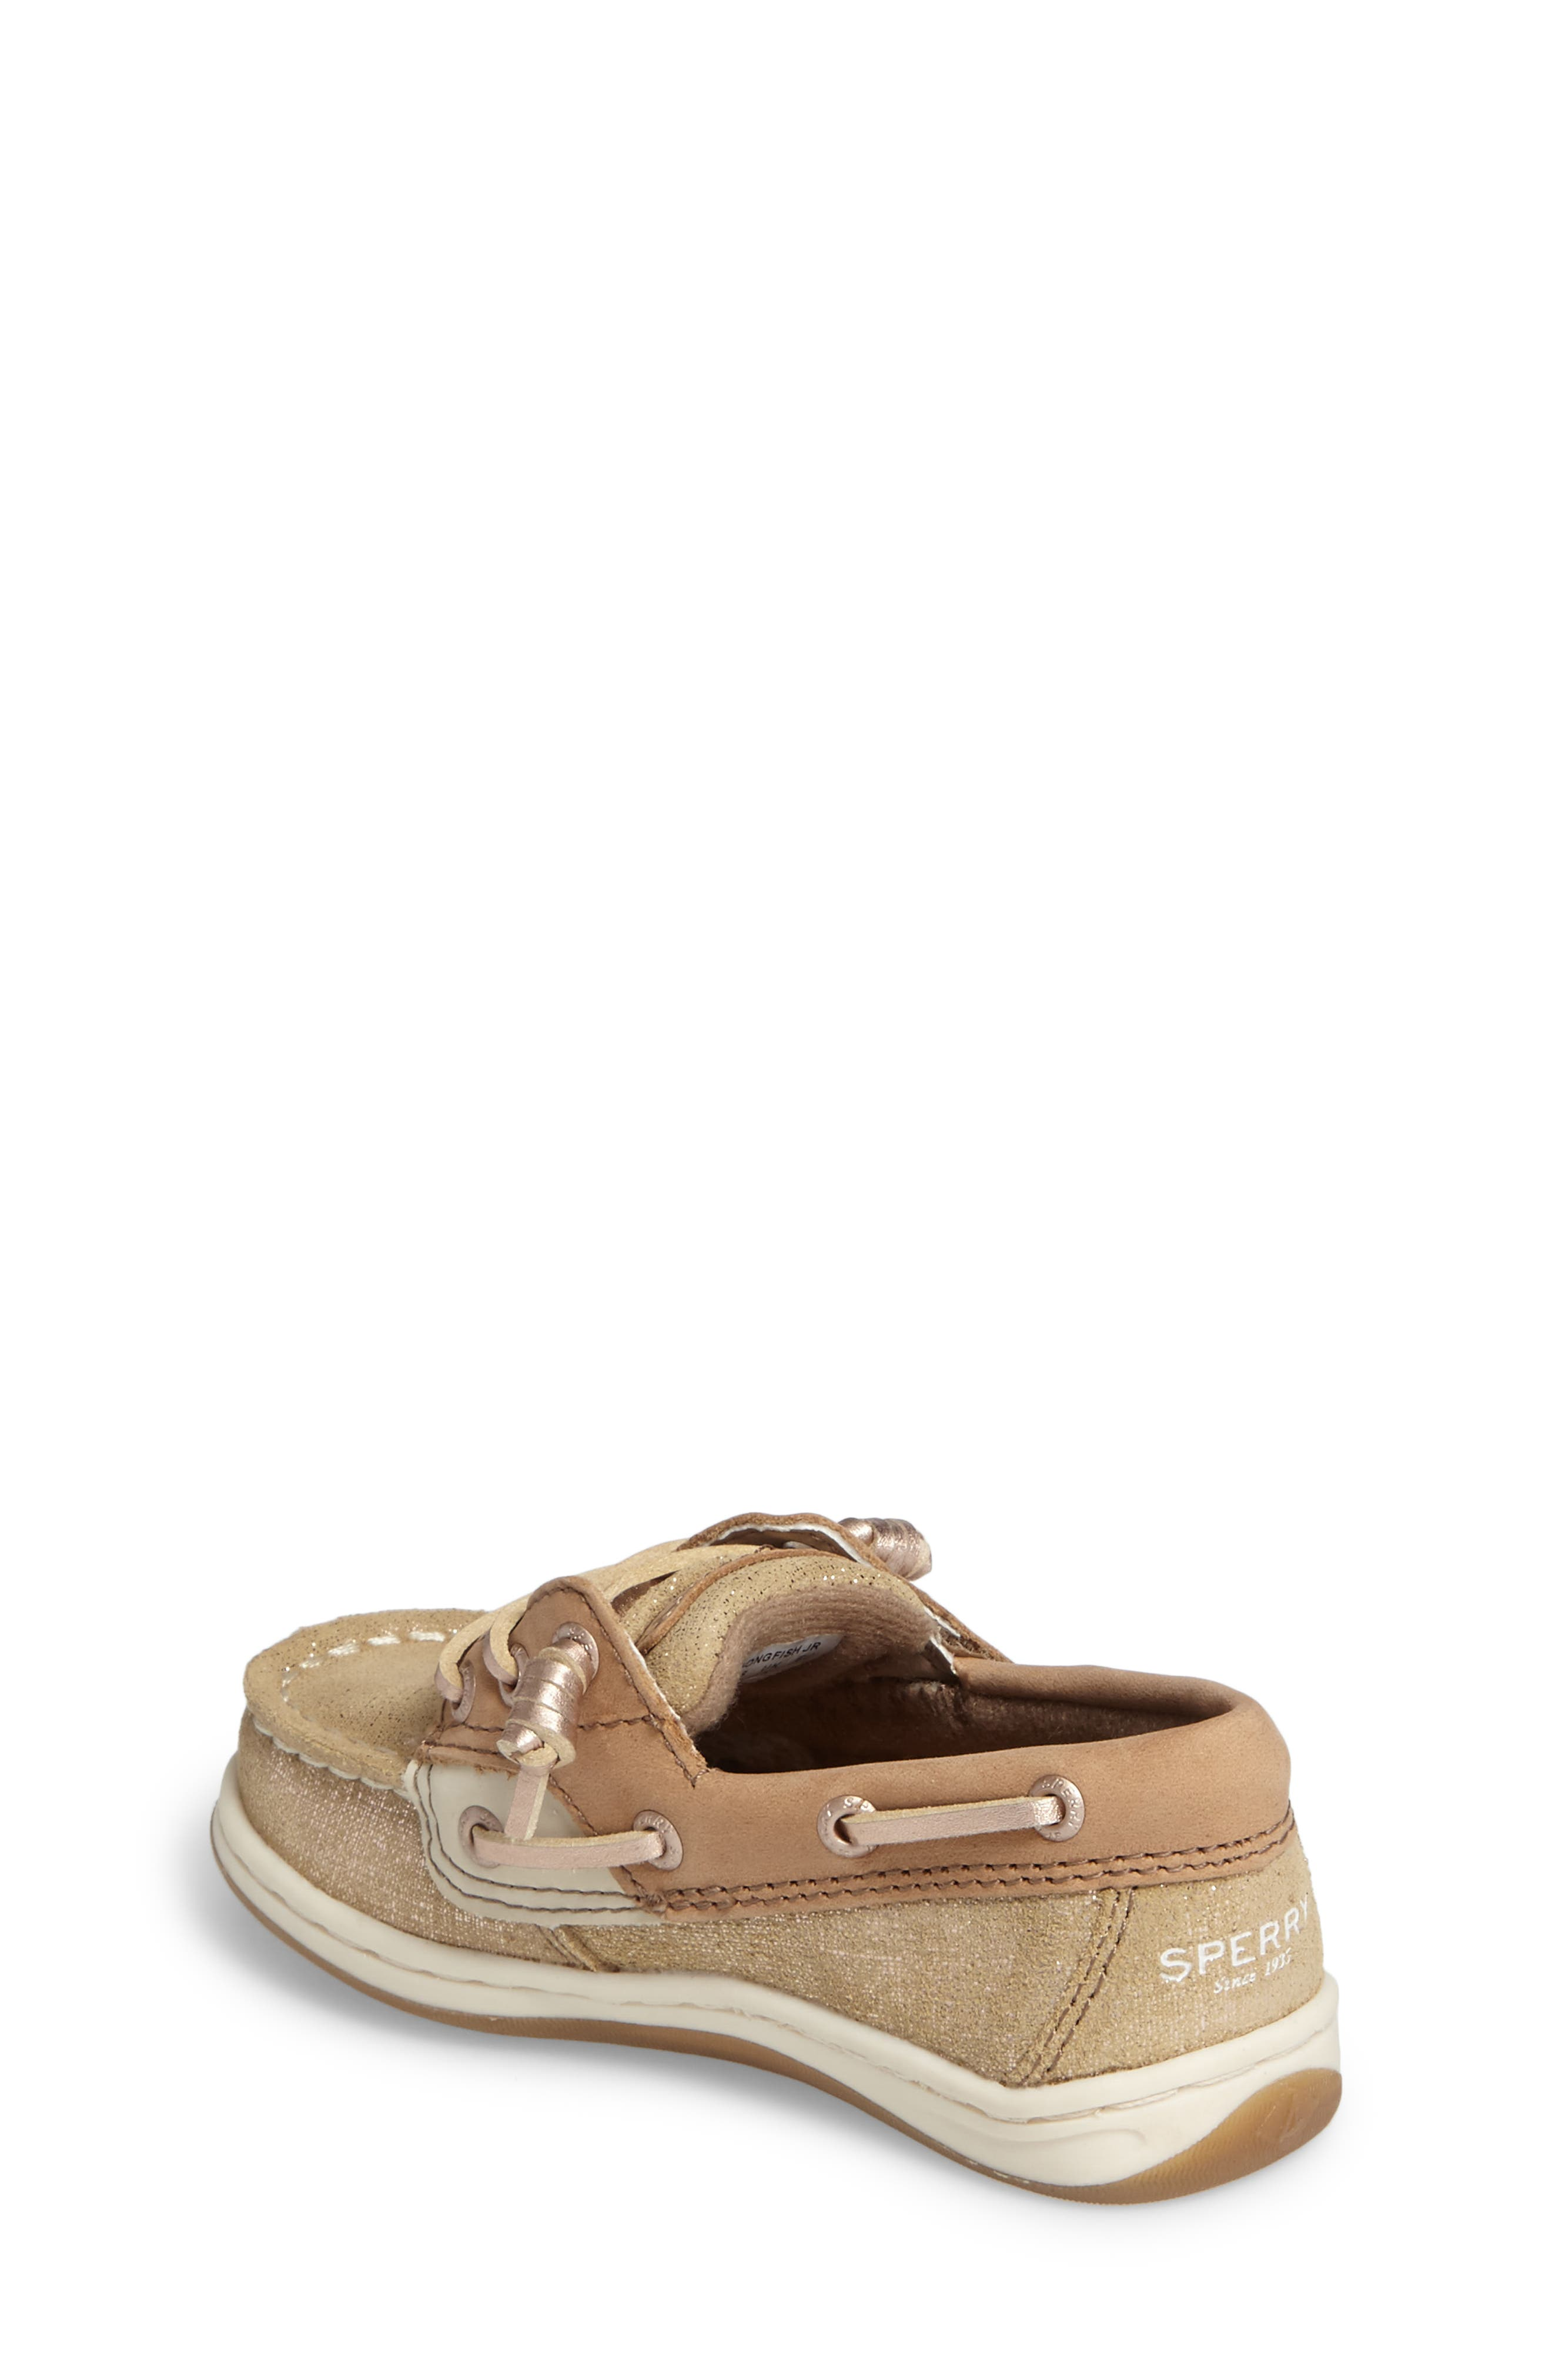 'Songfish Jr' Boat Shoe,                             Alternate thumbnail 2, color,                             Linen/ Gold